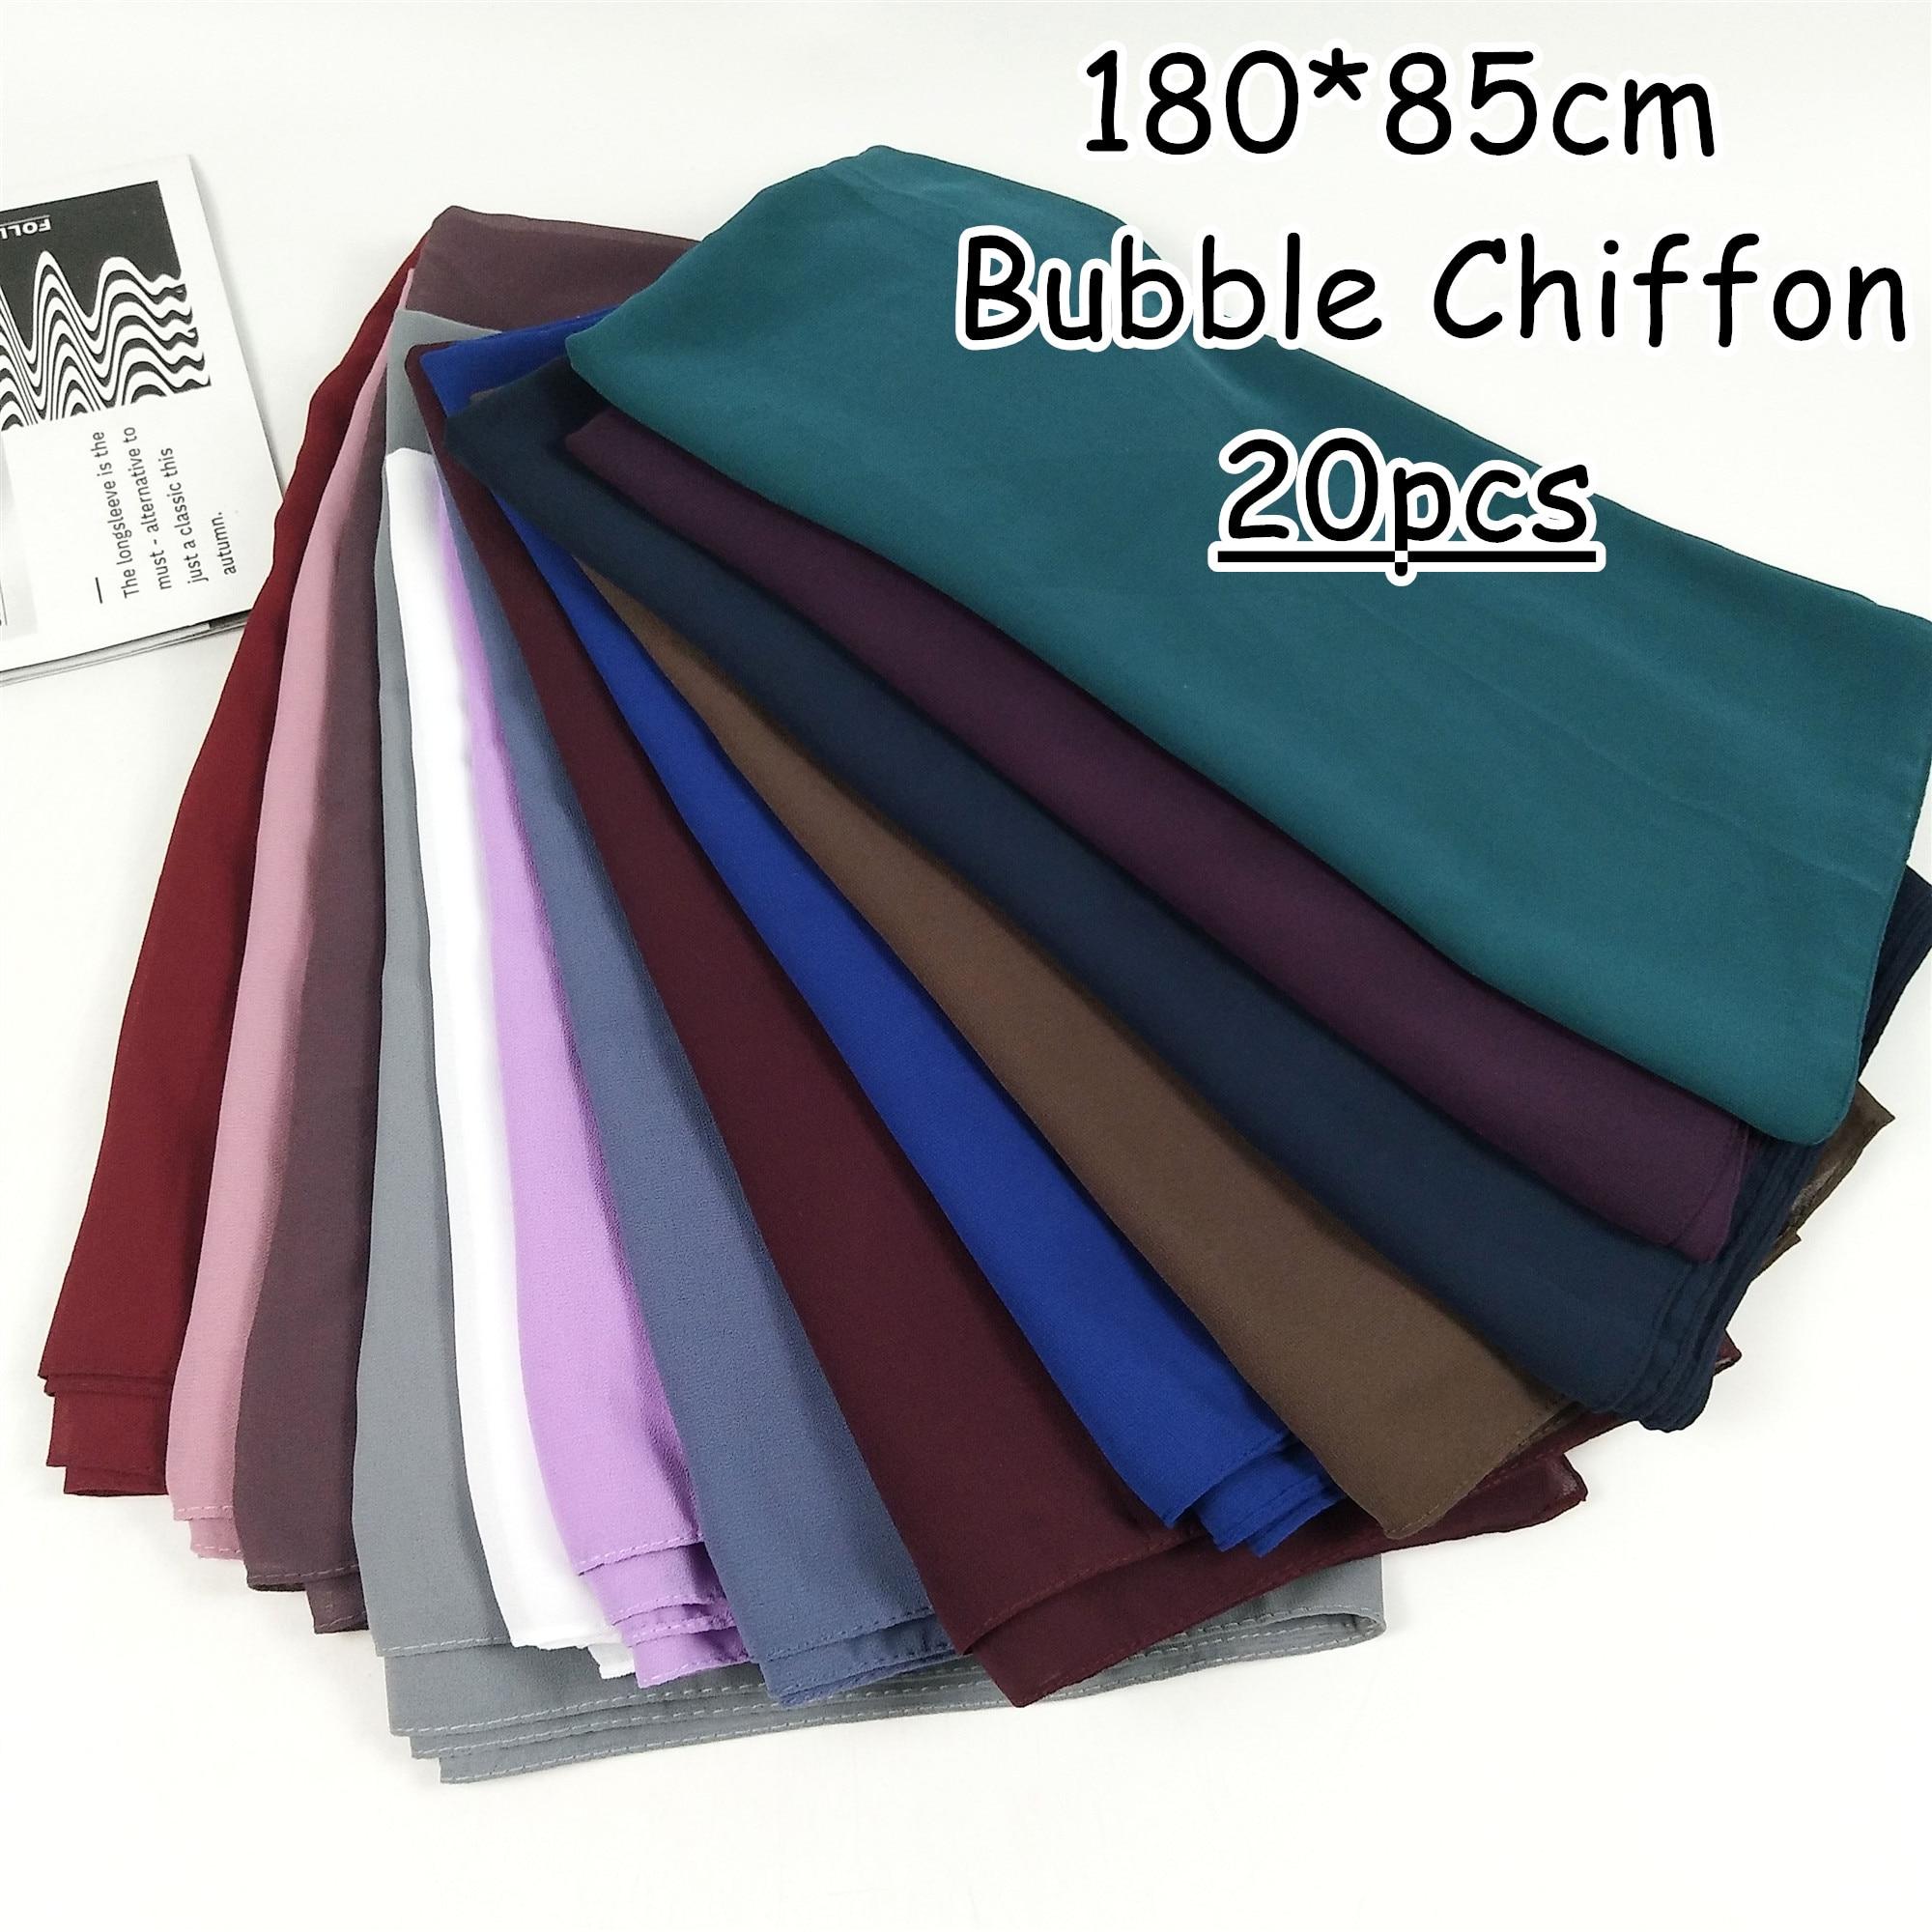 k9 Big size women High quality bubble chiffon printe solid color shawls hijab winter muslim scarves